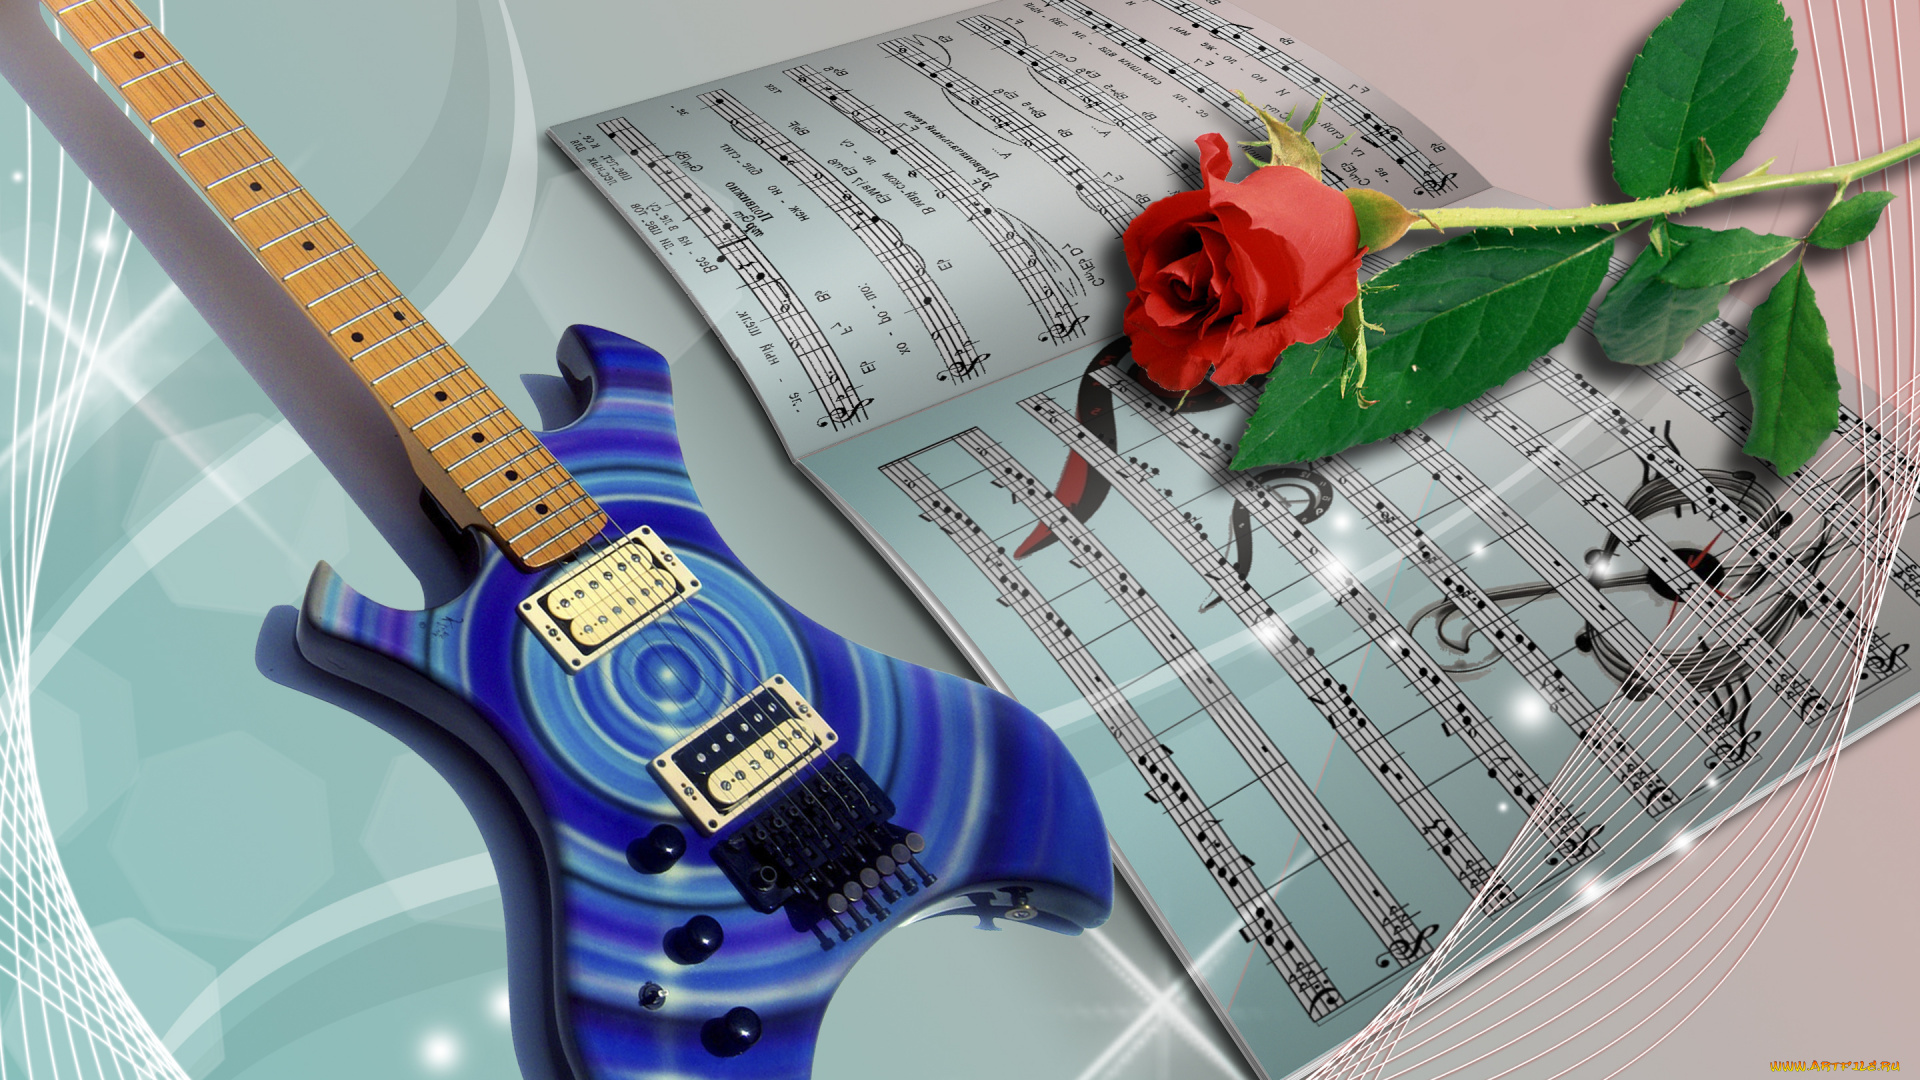 Коды к музыкальным открыткам